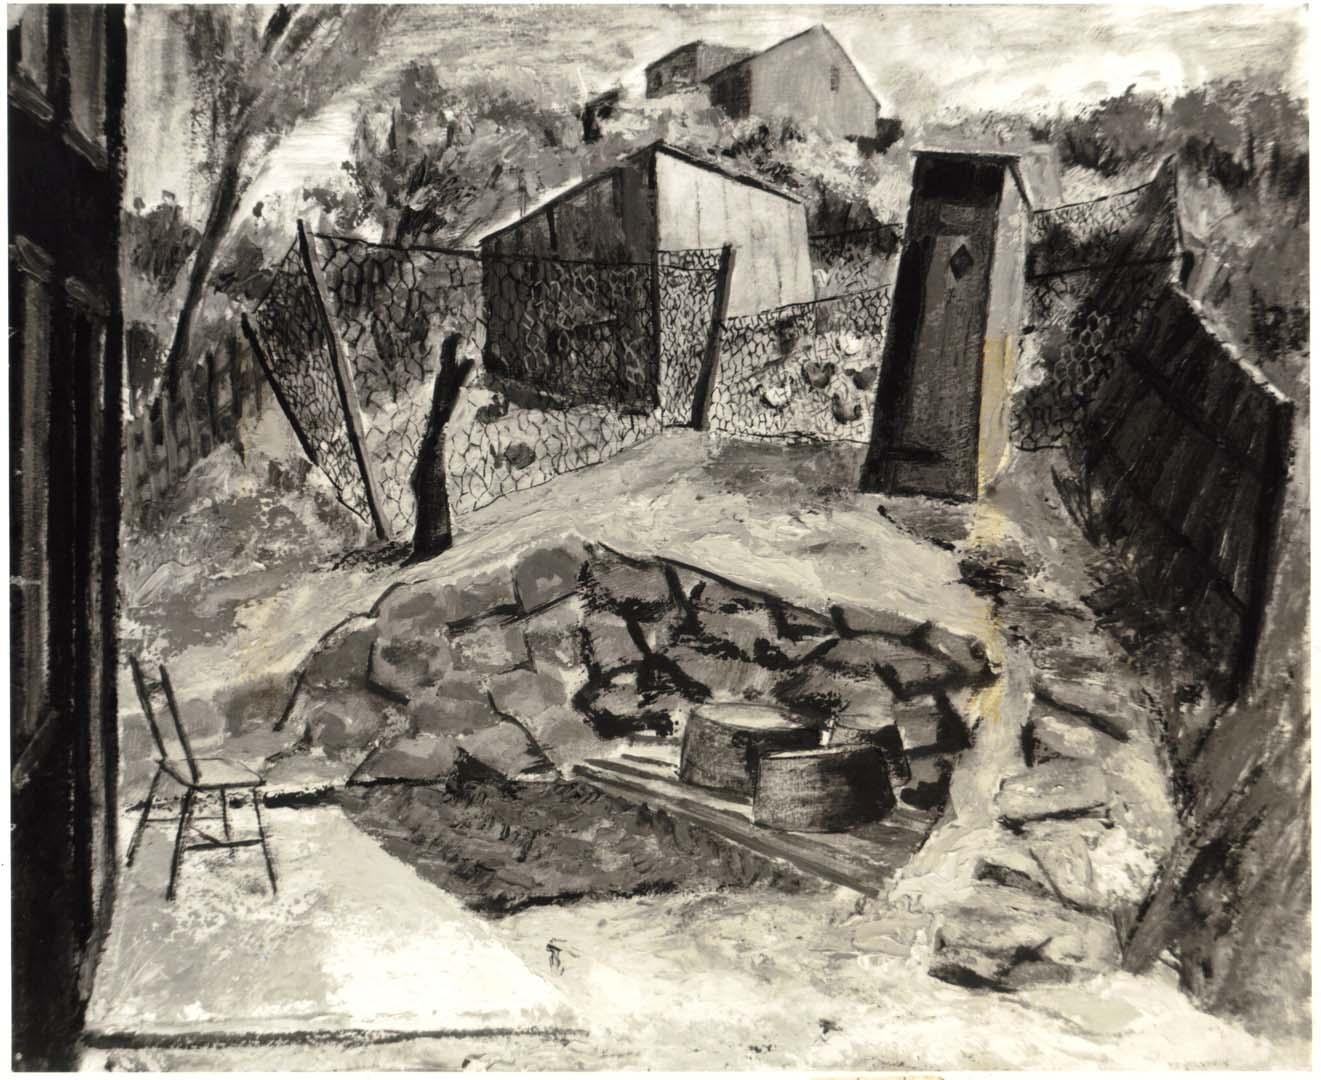 1947 Country Backyard Oil on Board 20 x 24